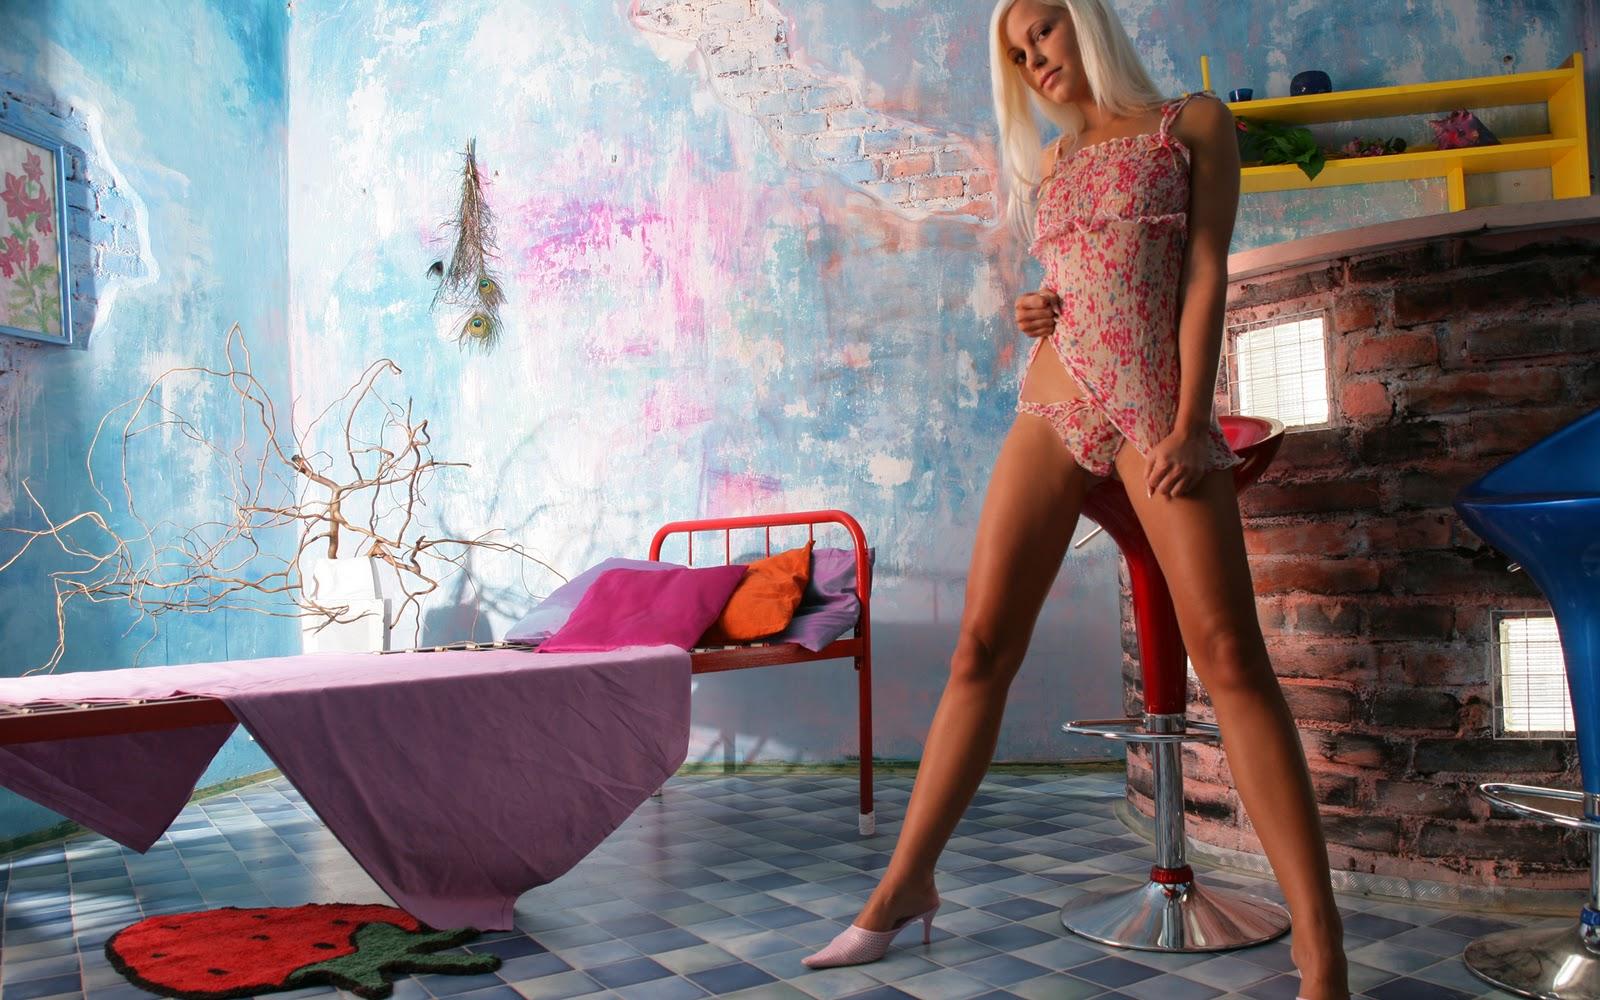 http://1.bp.blogspot.com/_Y5-4Z4aPcOI/TUpYZ3e2KHI/AAAAAAAABaY/kMSowXj3-VE/s1600/dido-acquerello-1920x1200-001.jpg